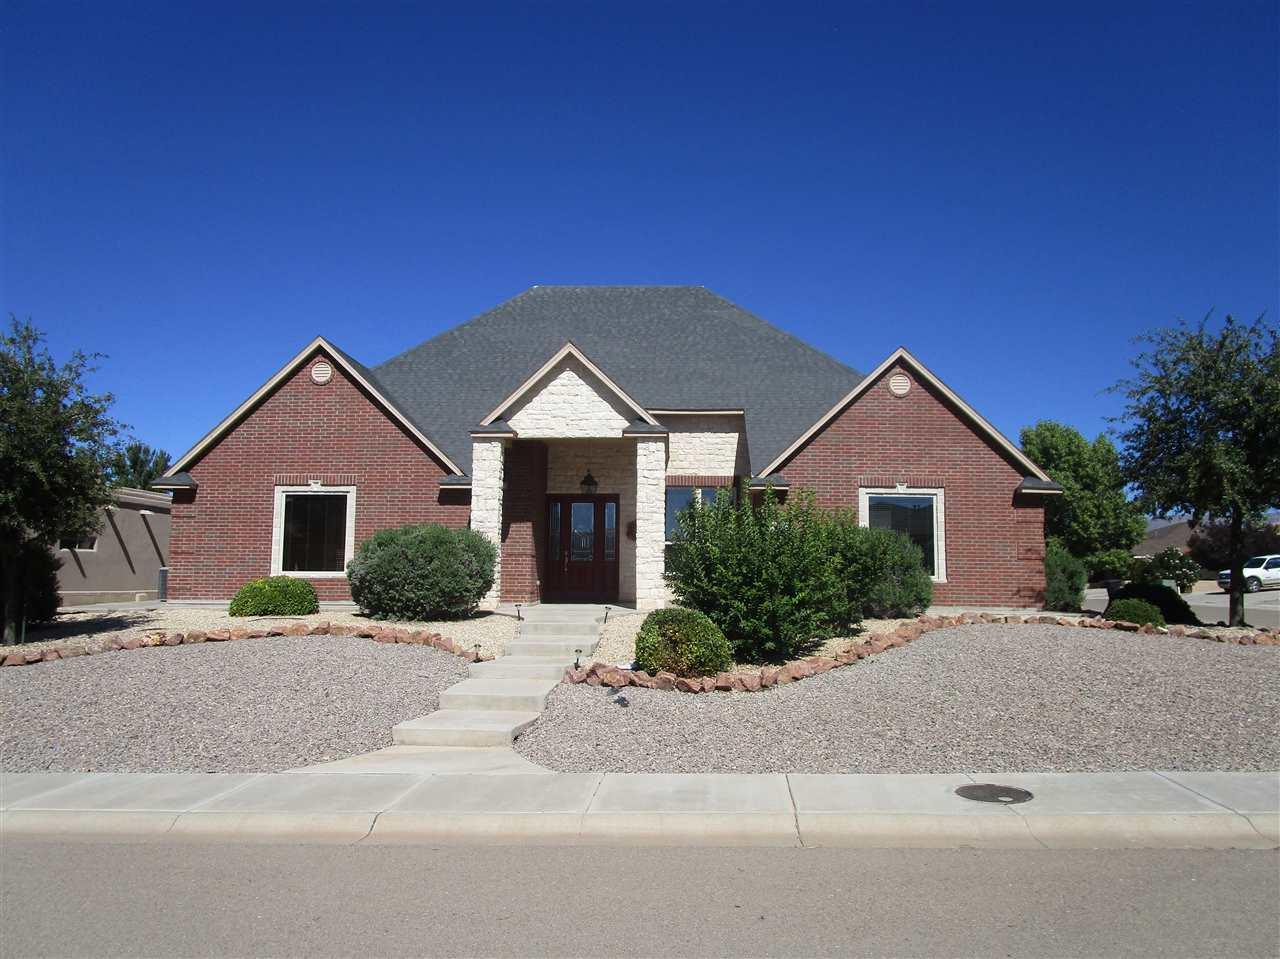 Home 451 Cielo Grande For Sale